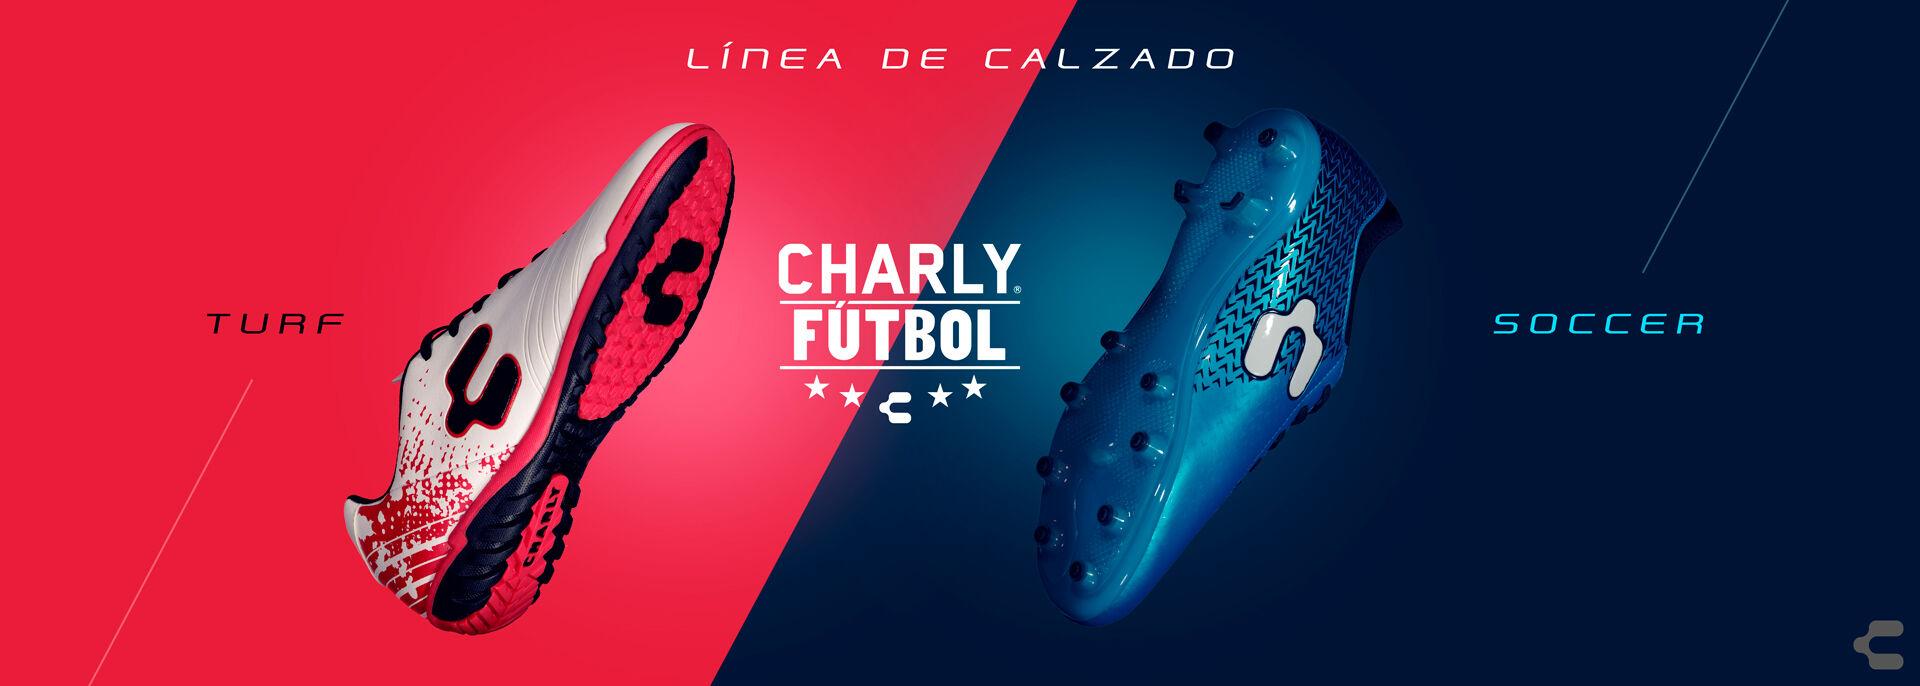 1920X686_Soccer.jpg